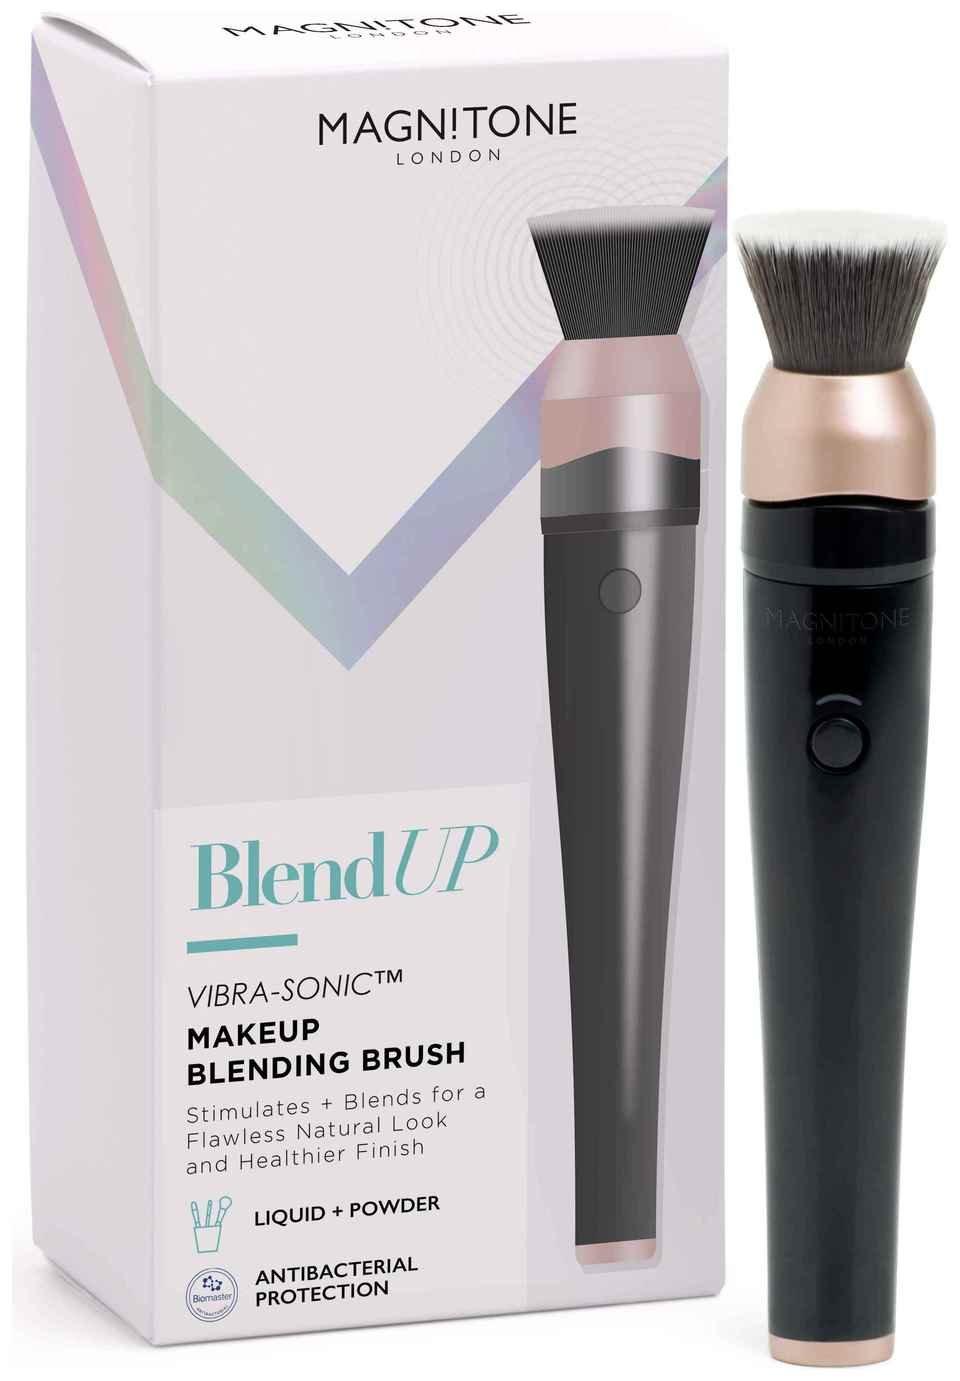 Magnitone Blend Up Vibra-Sonic Makeup Blending Brush - Black